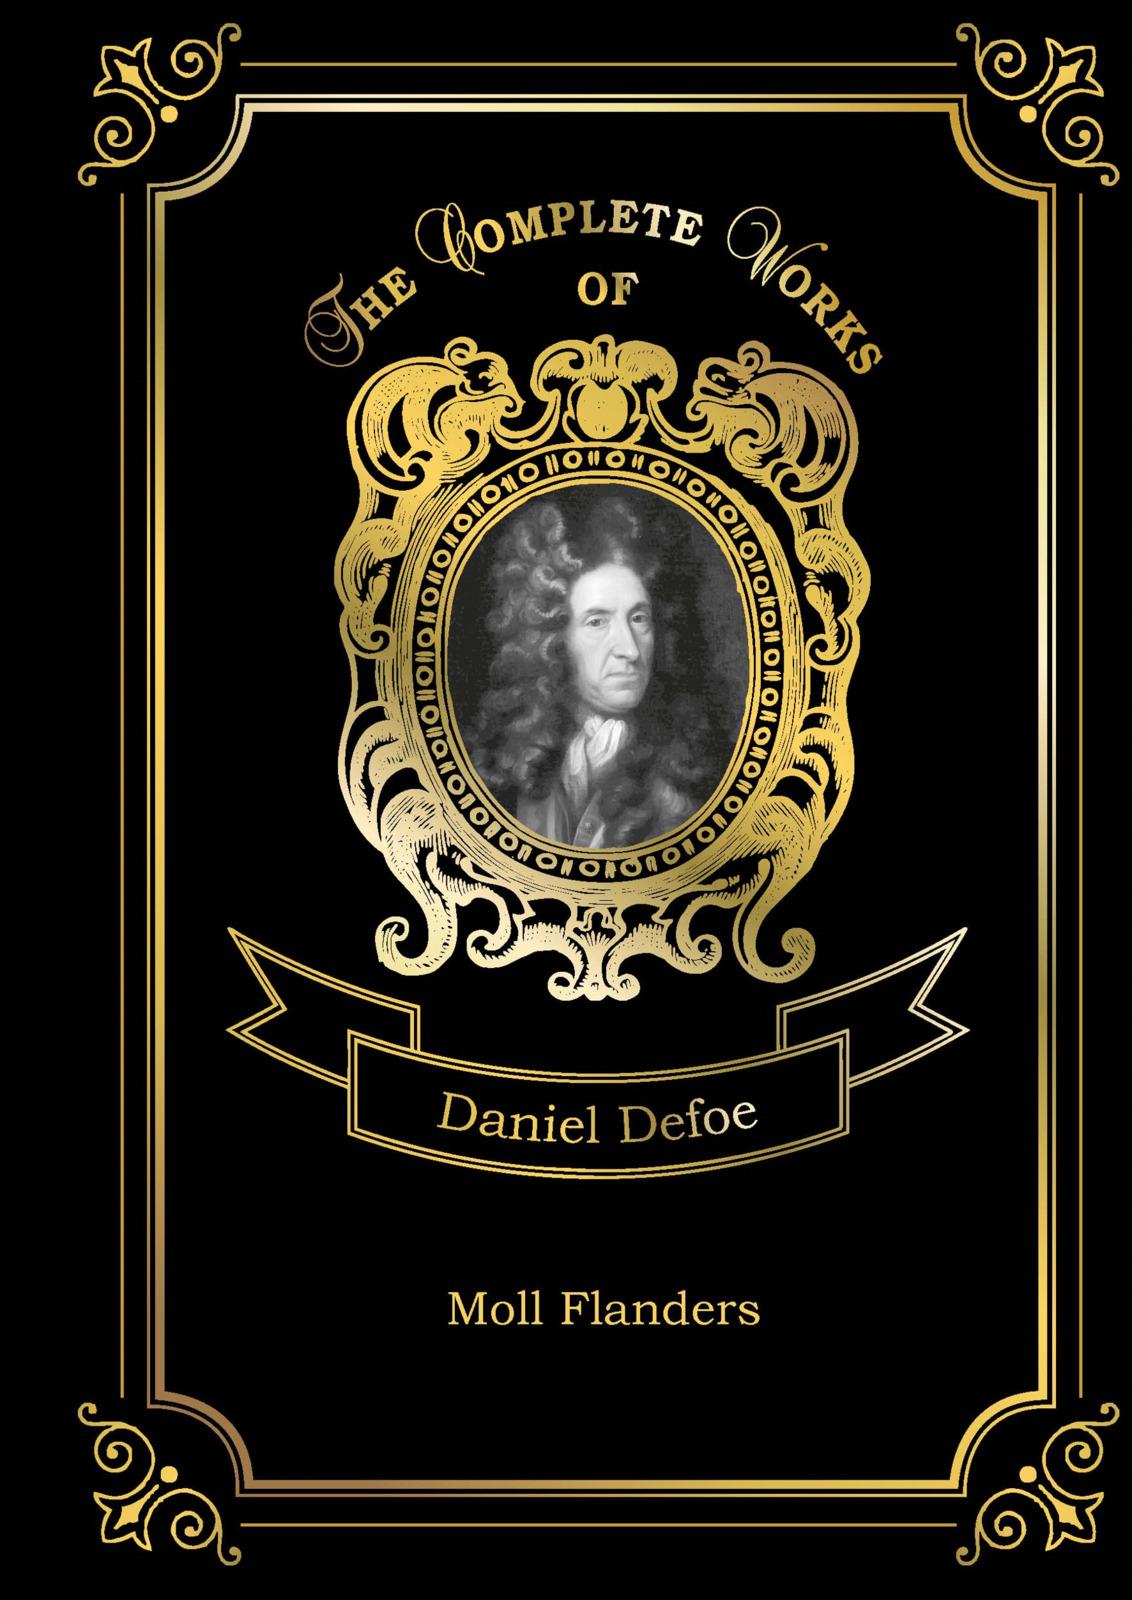 Defoe Daniel Moll Flanders daniel defoe moll flanders